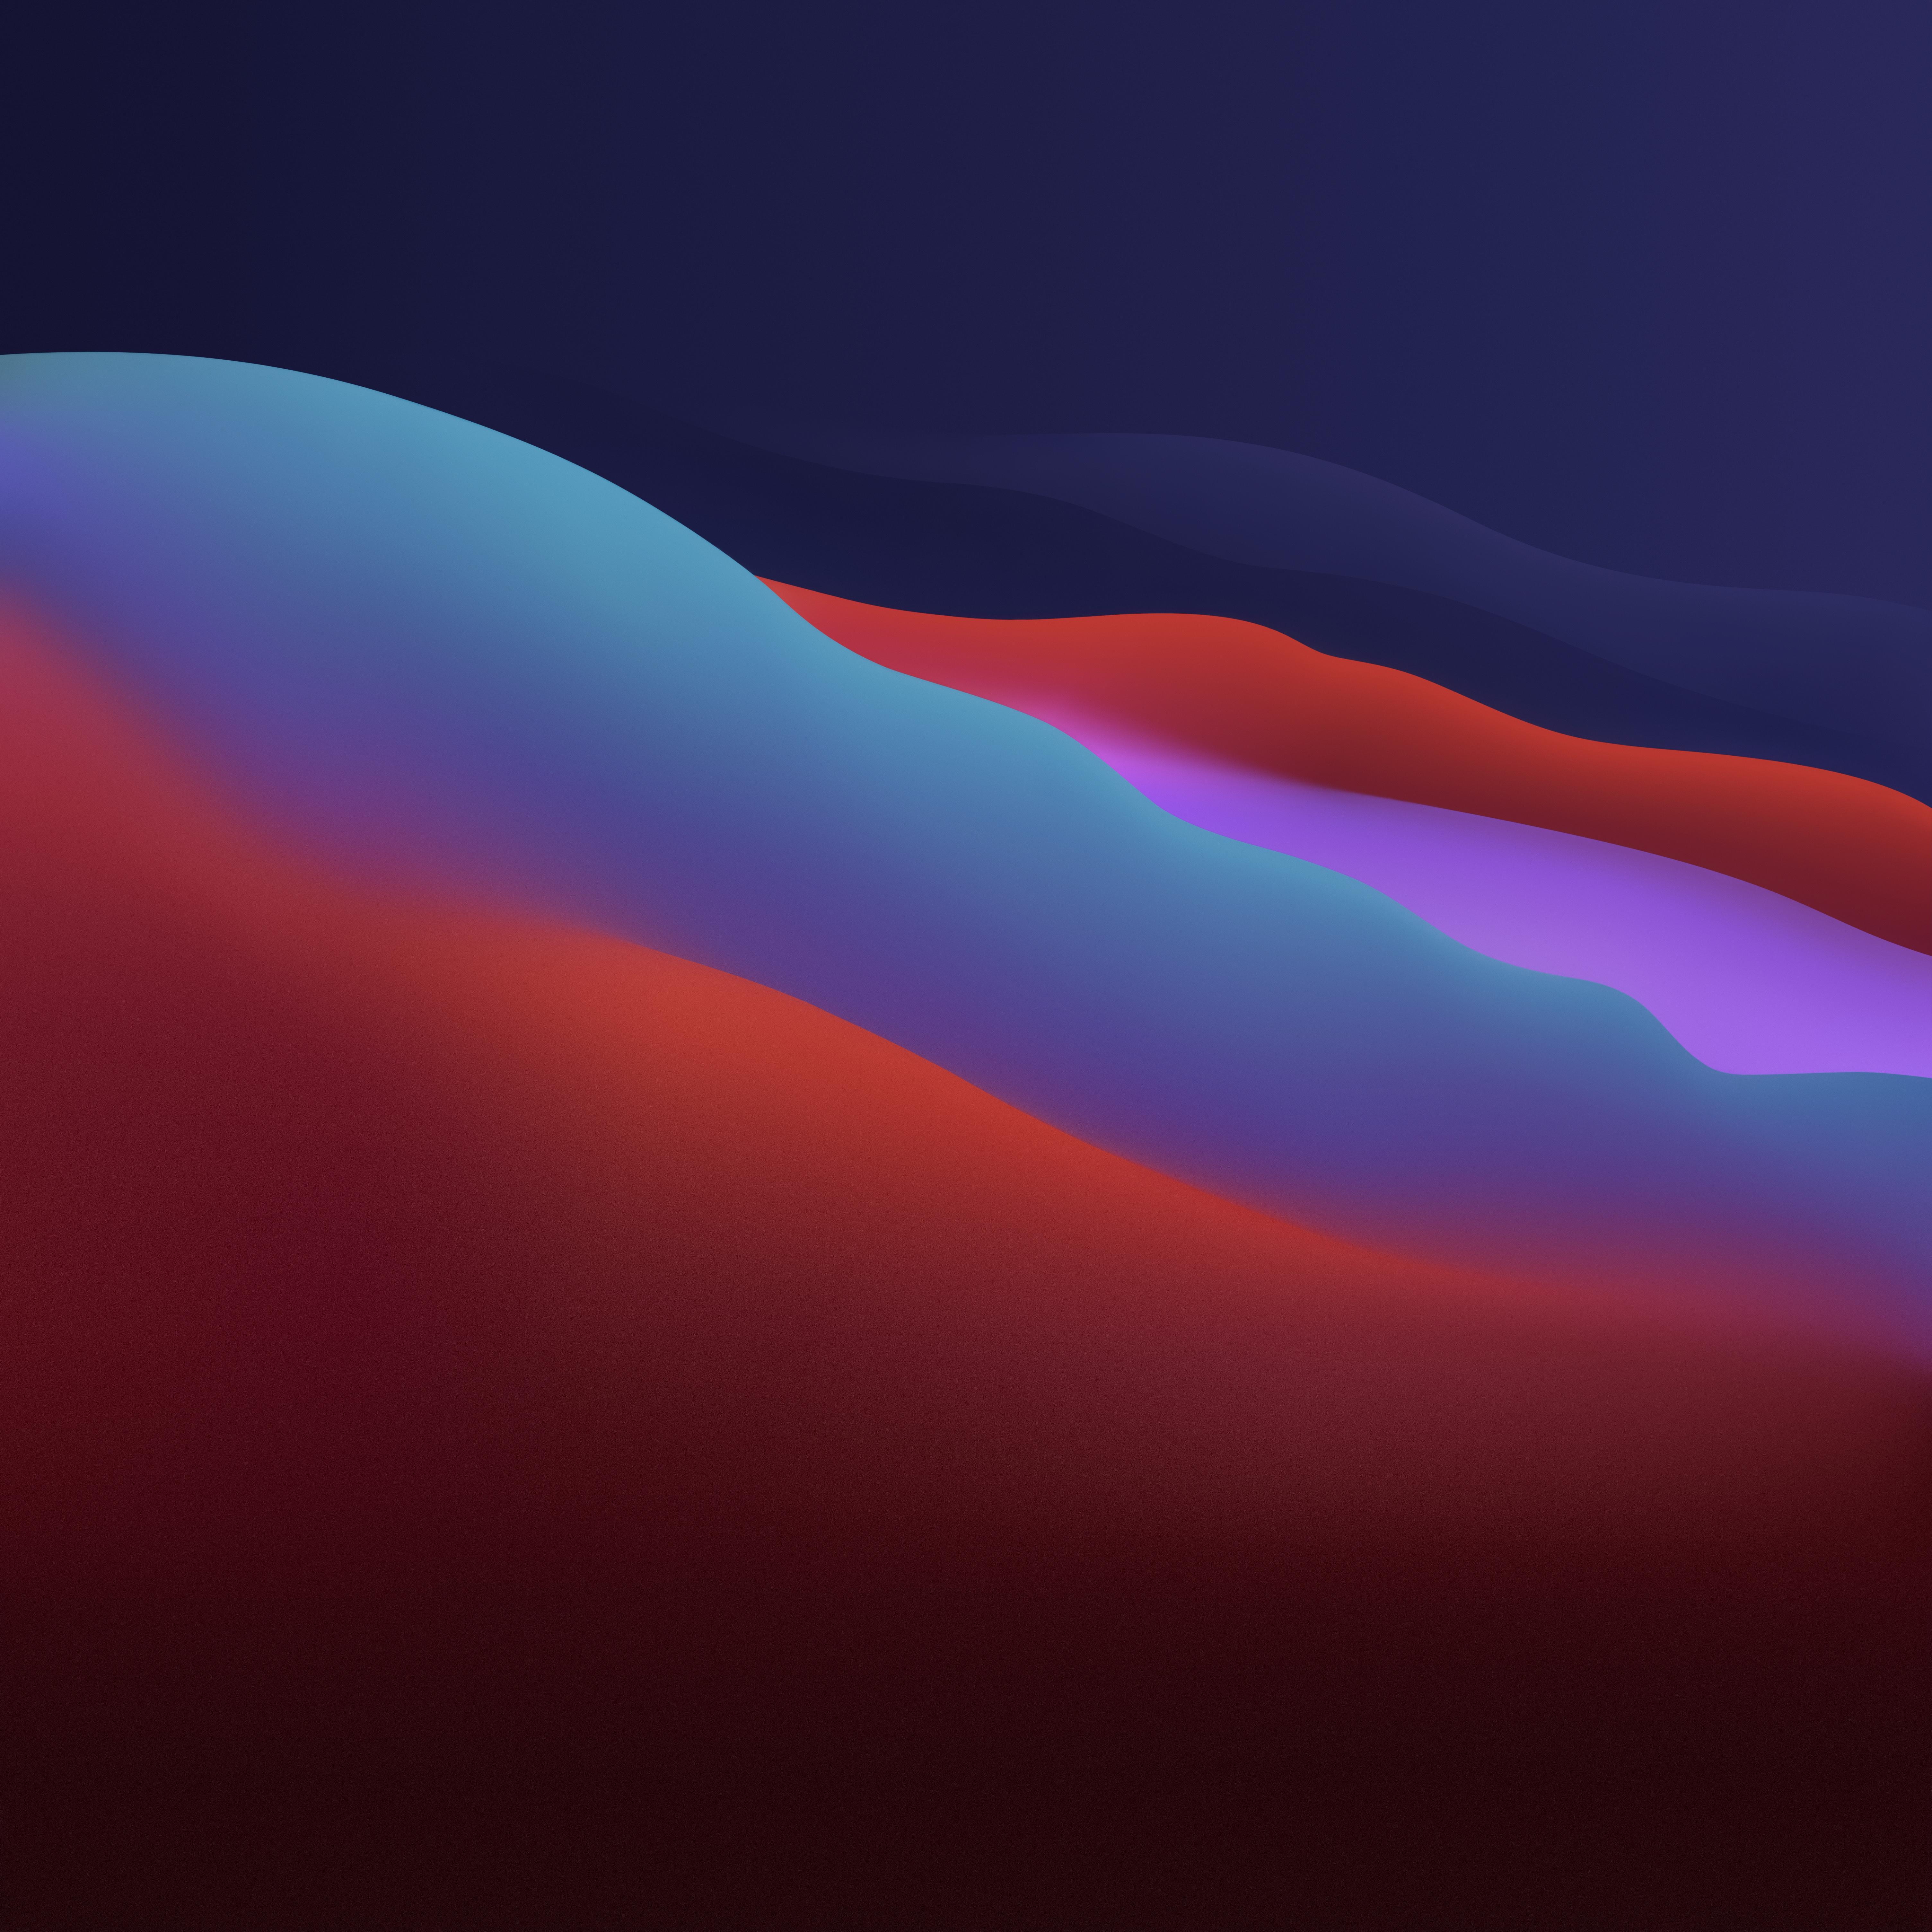 Macos Big Sur 4k Wallpaper Apple Layers Fluidic Colorful Dark Wwdc 2020 5k Gradients 1432